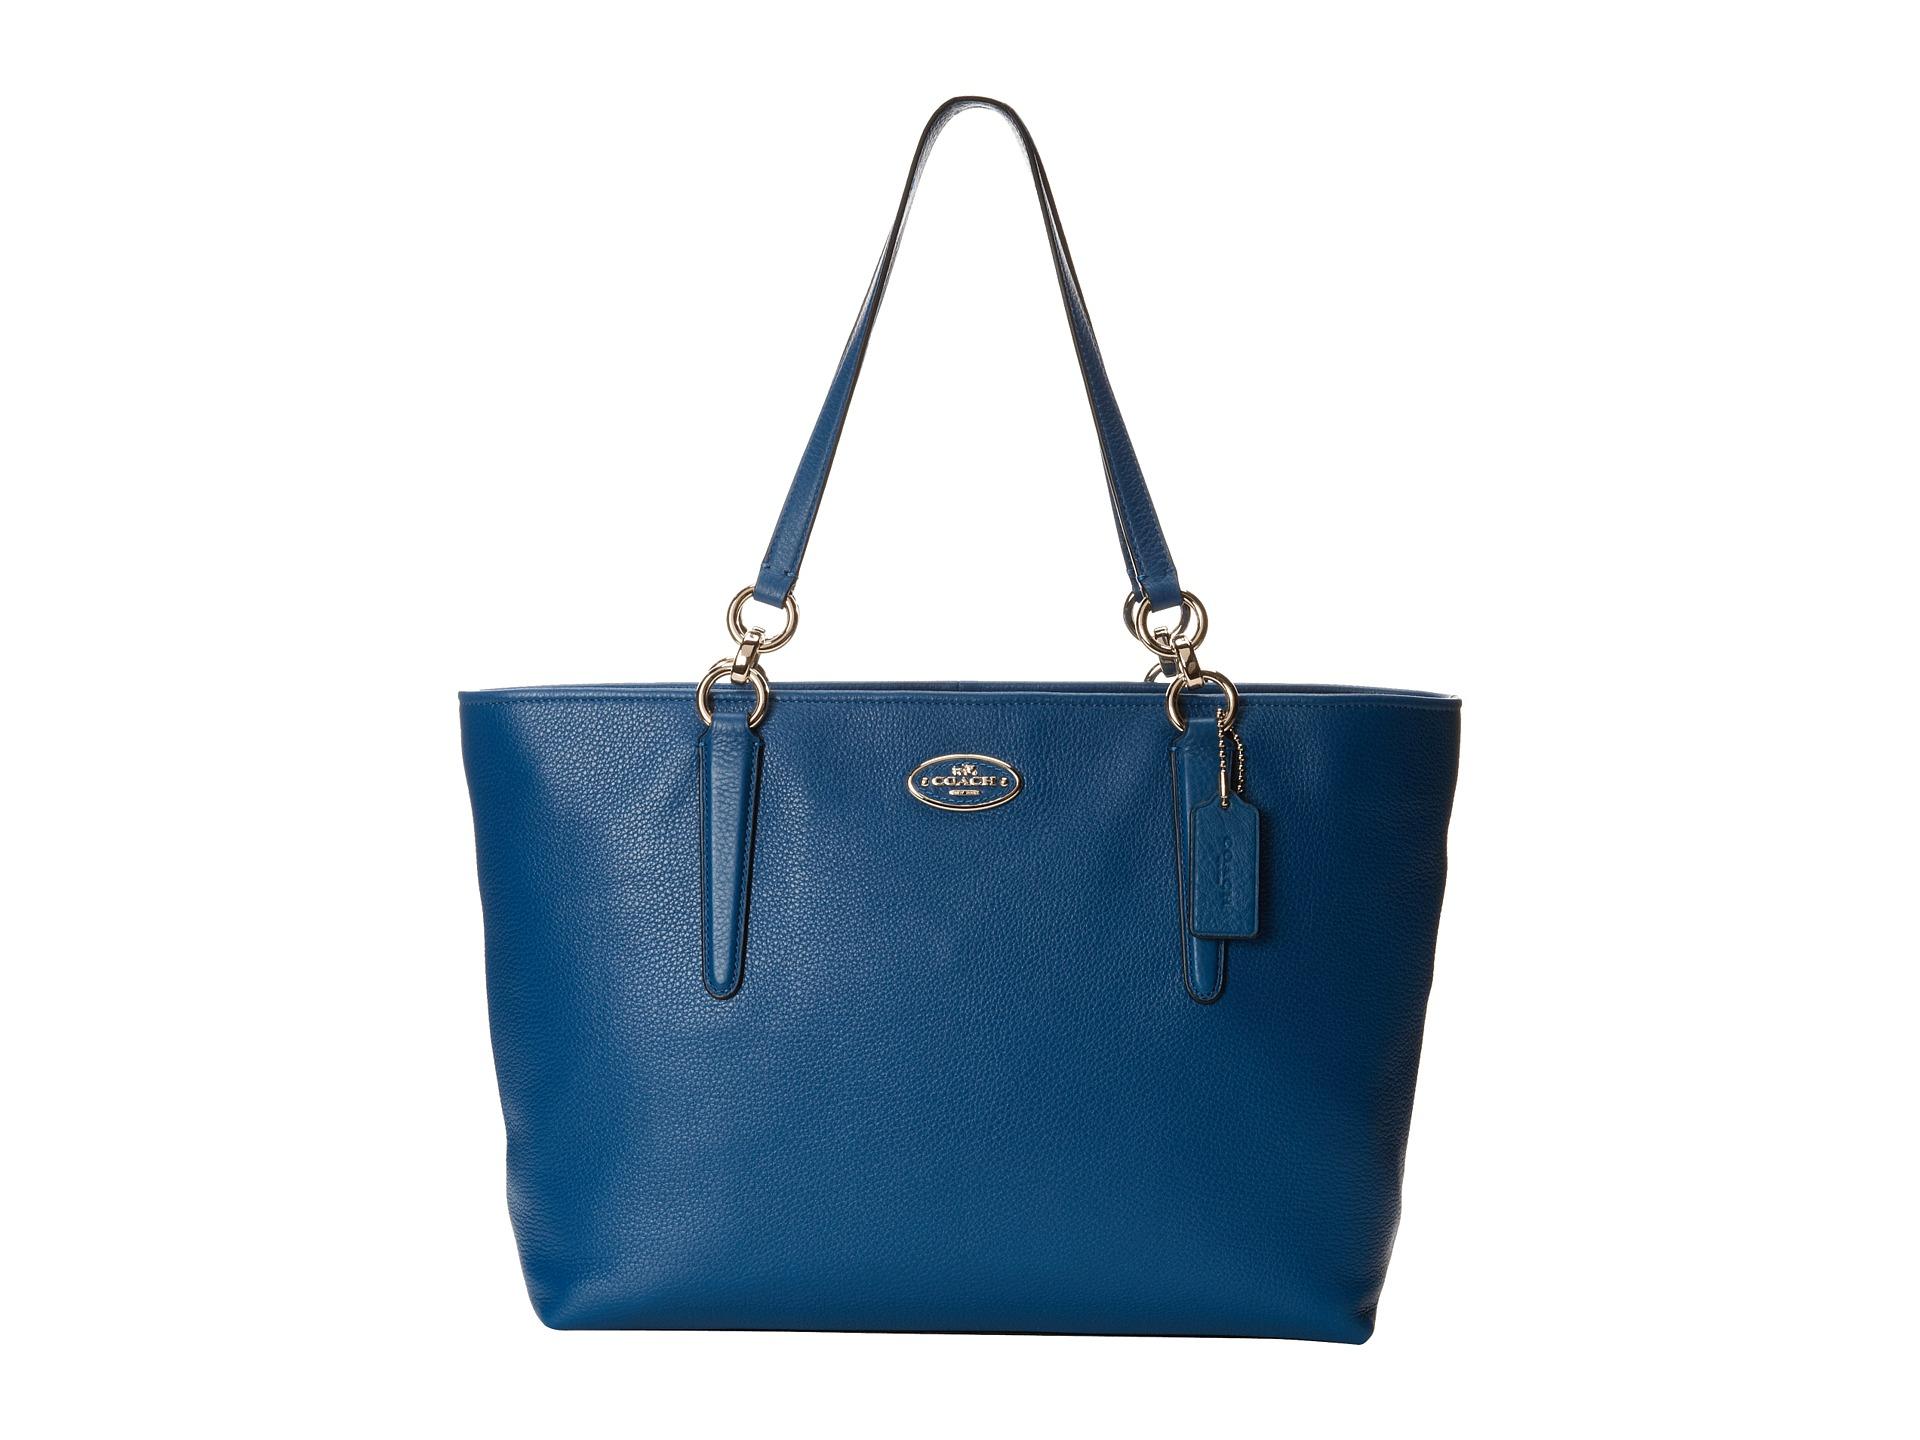 Coach Bags Chicago Ellis Tote LI/Denim - Handbags